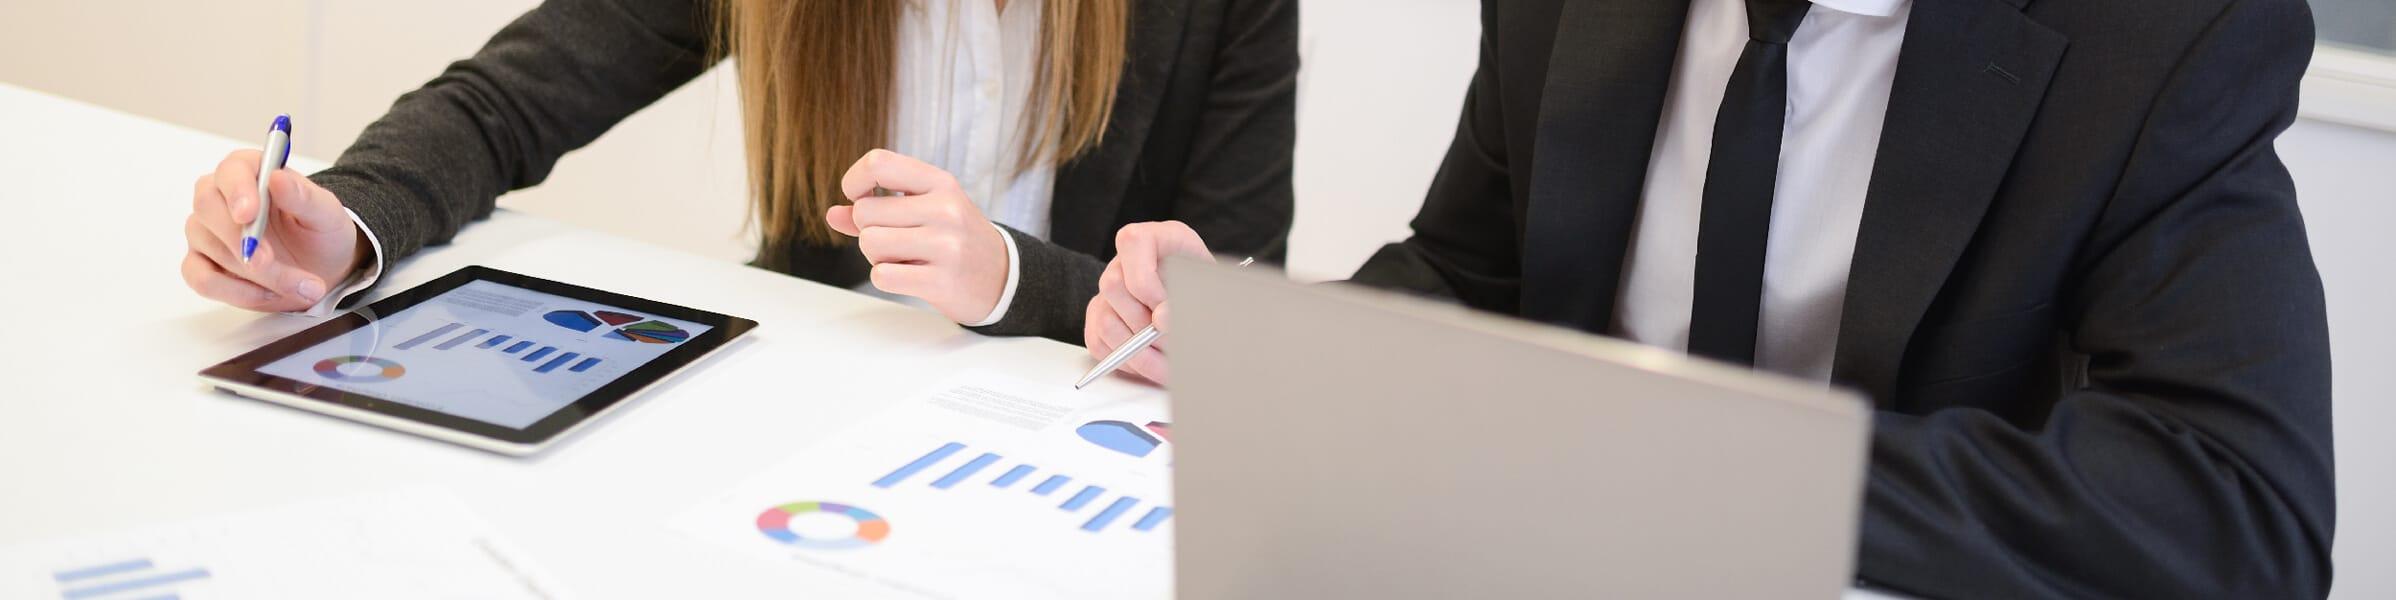 Diplomado en Business Intelligence and Analytics